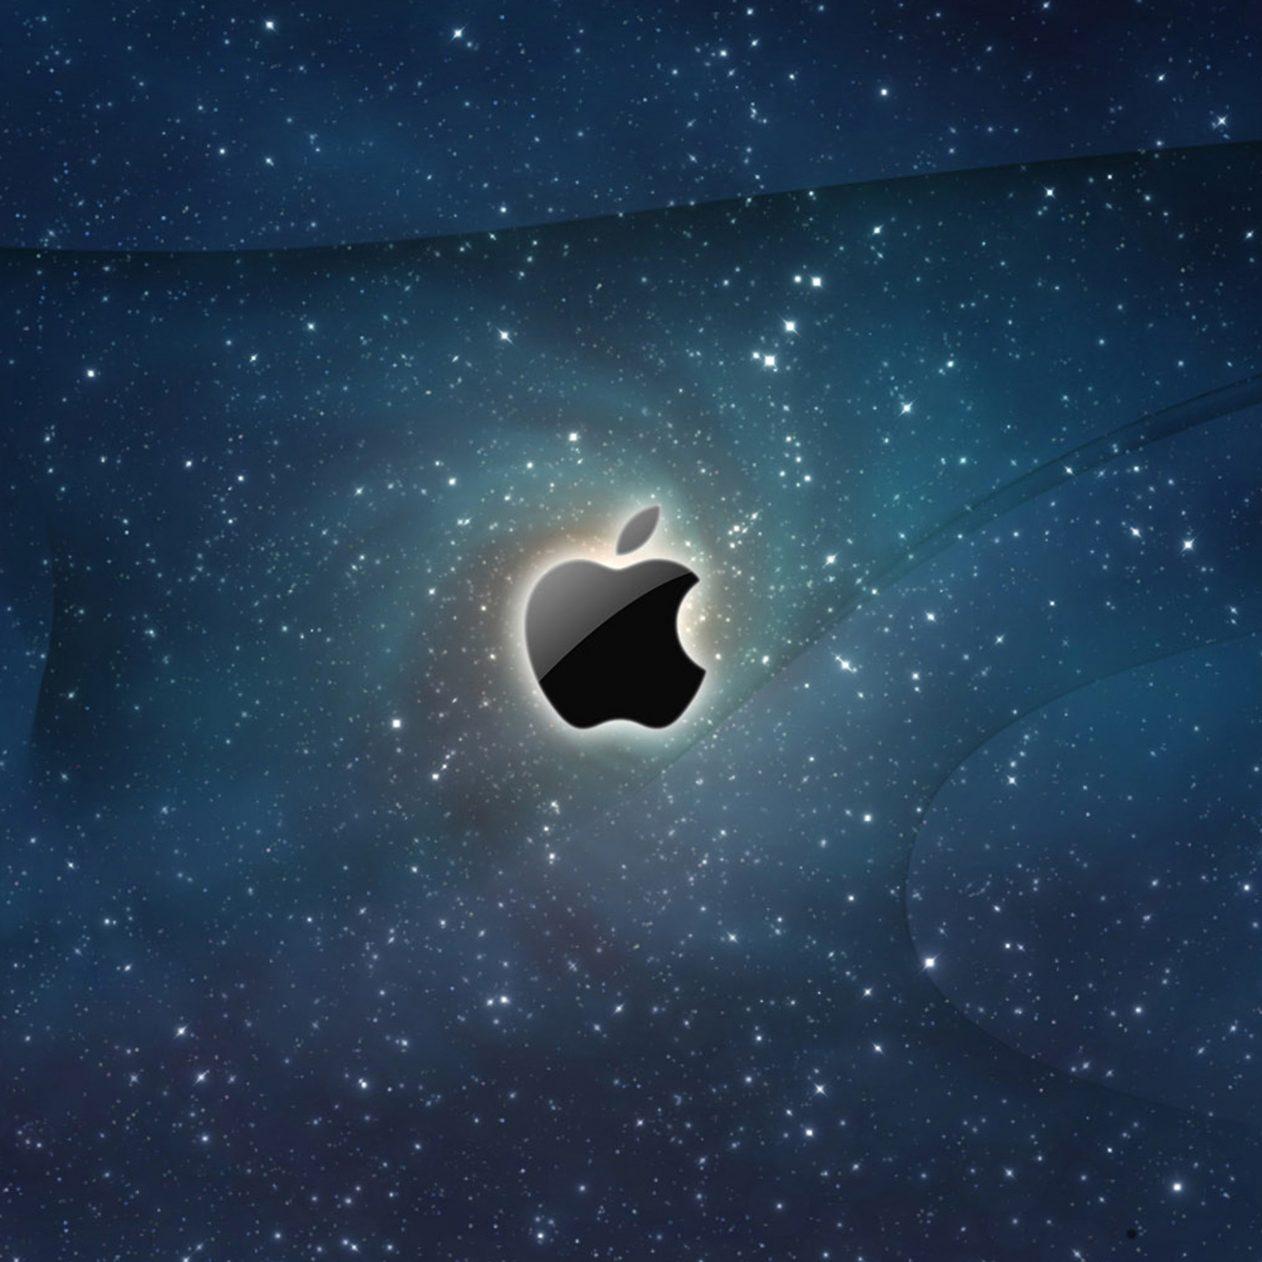 1262x1262 Parallax wallpaper 4k Apple Space Ipad Wallpaper 1262x1262 pixels resolution